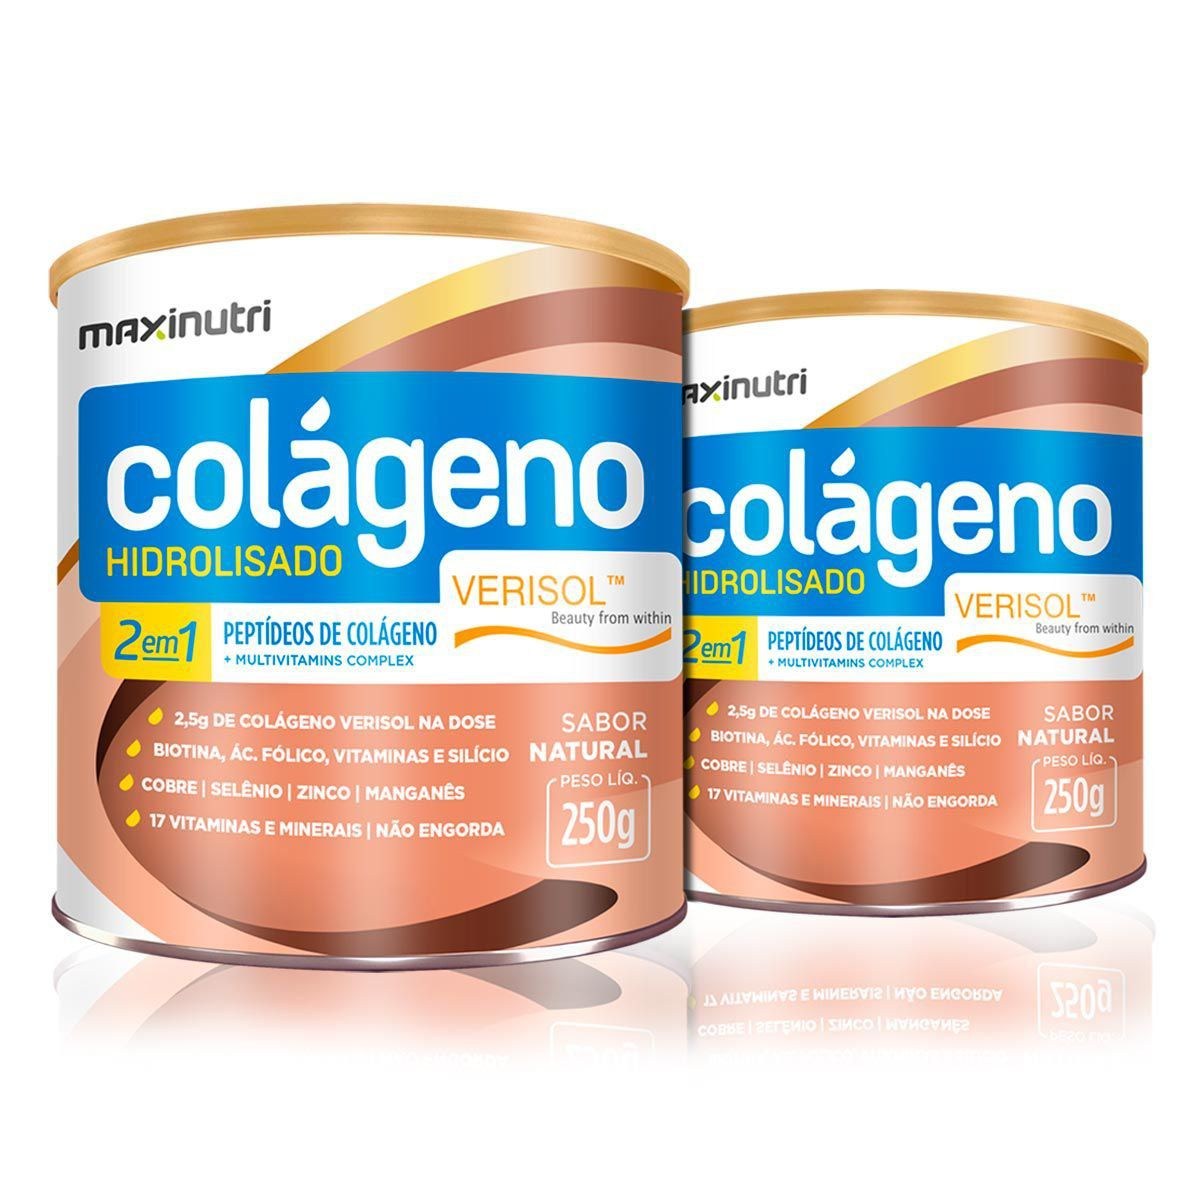 Combo 2x Colágeno Hidrolisado 2 em 1 Verisol 250g - Maxinutri